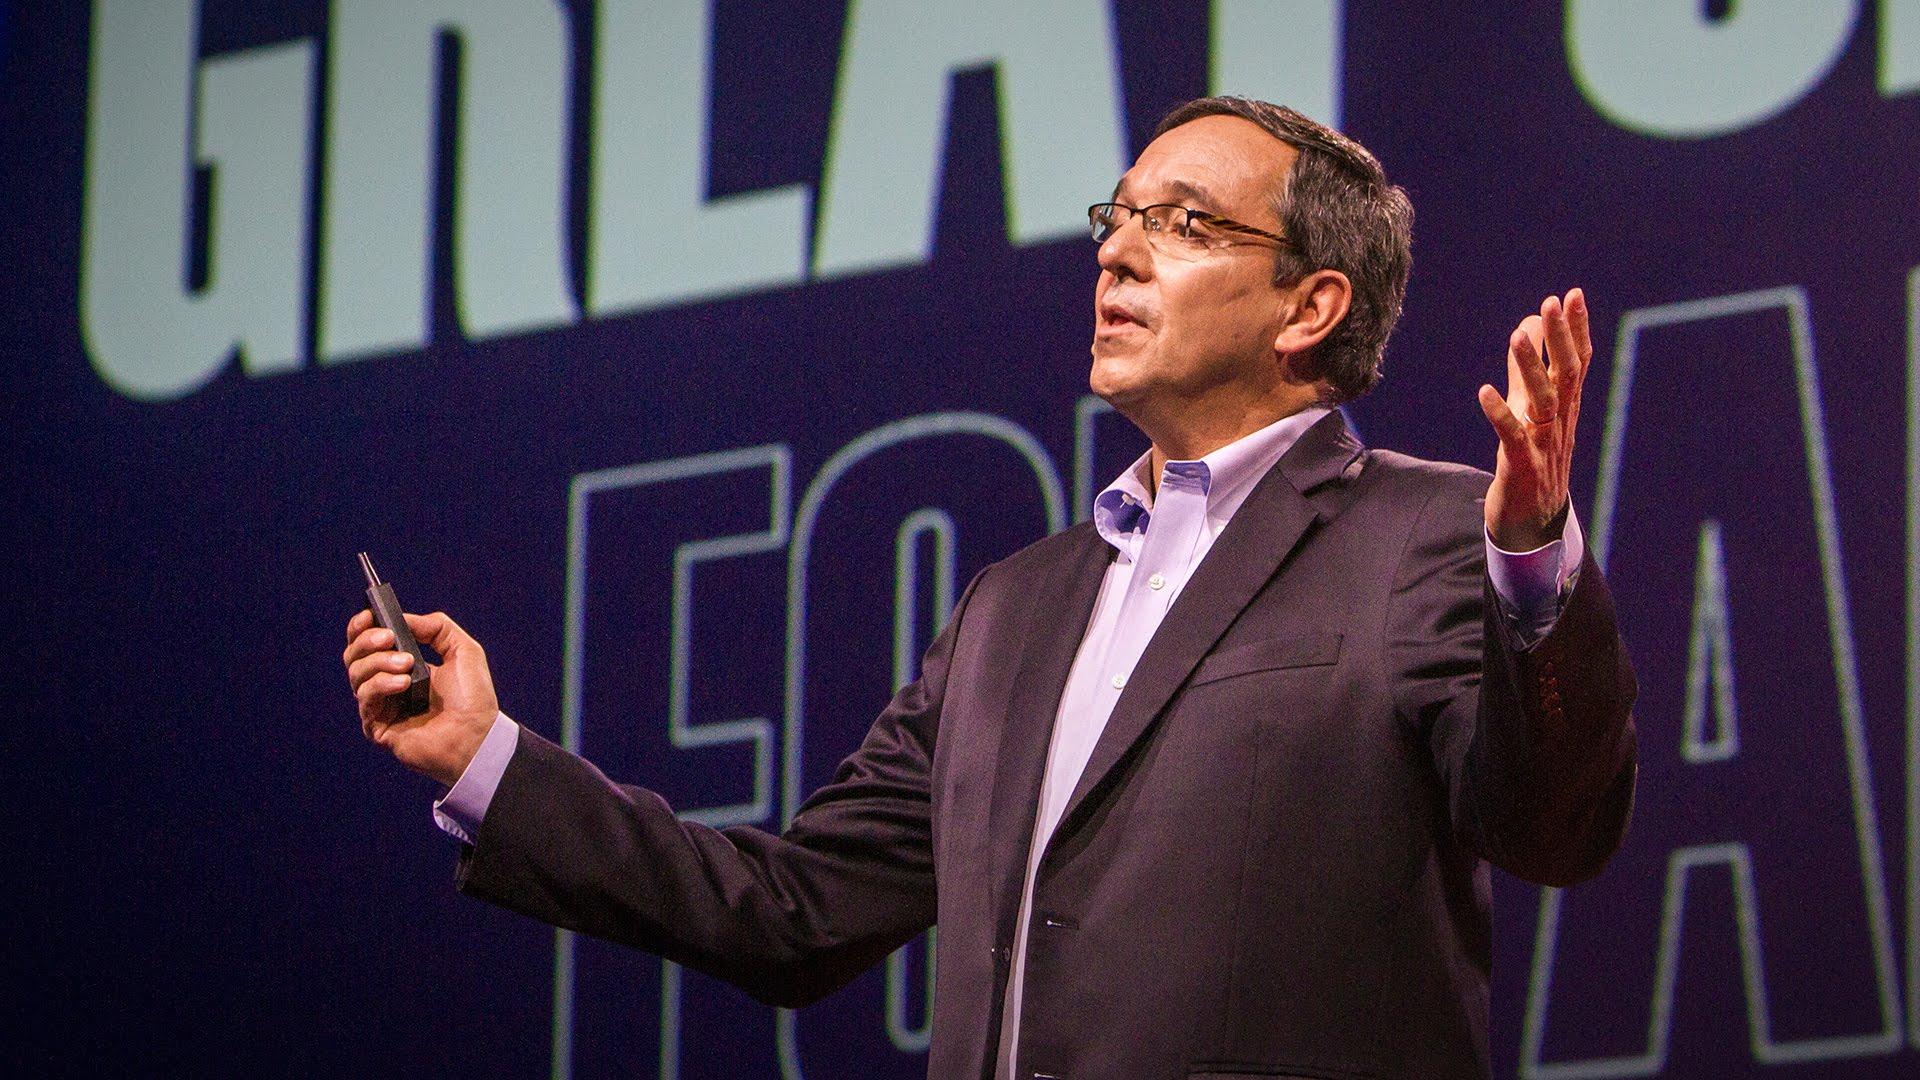 Gil Penalosa's Ted Talk